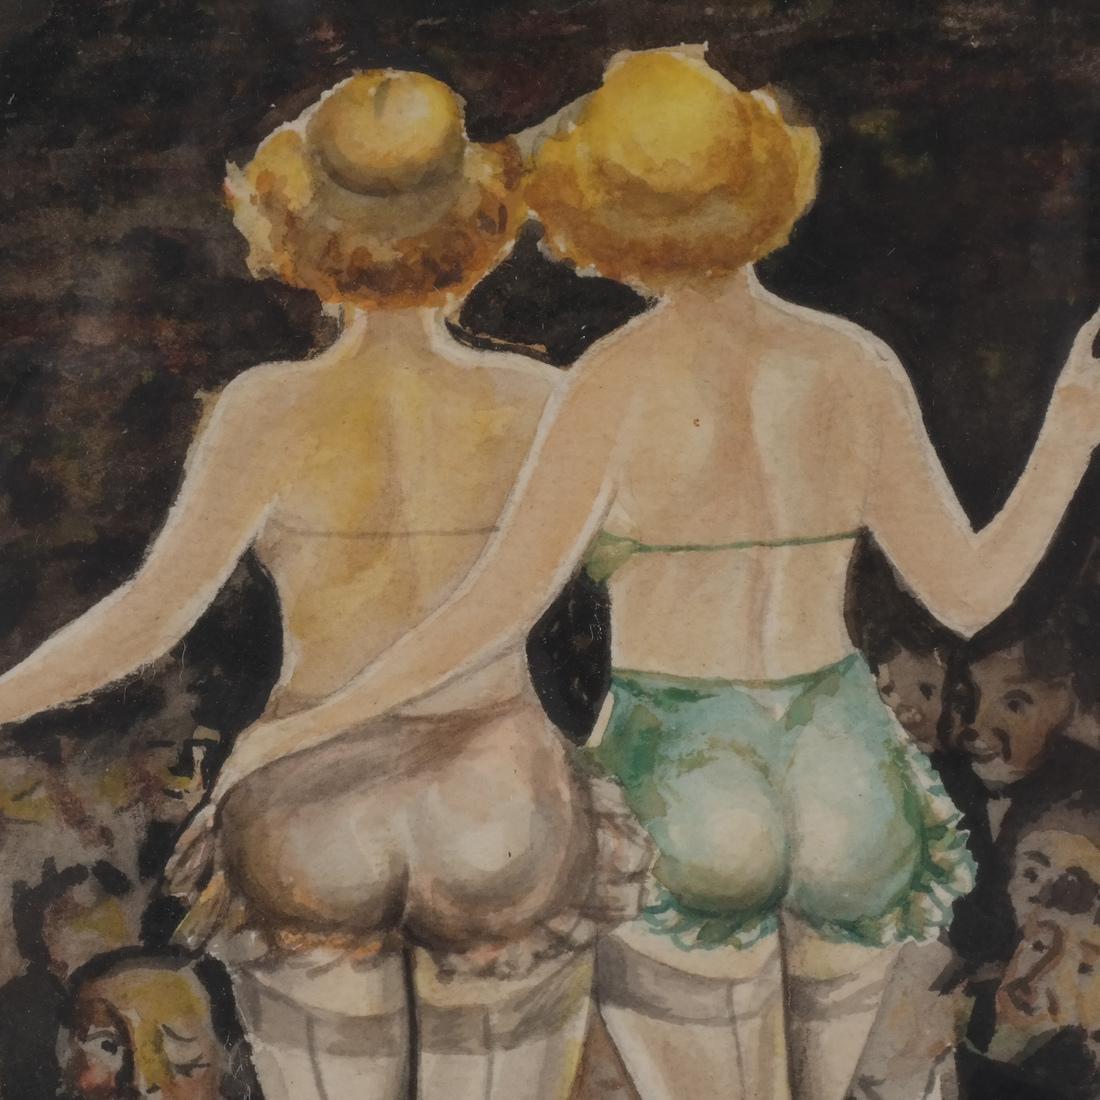 A.J. Plotnik: Watercolor - Dancers - 4